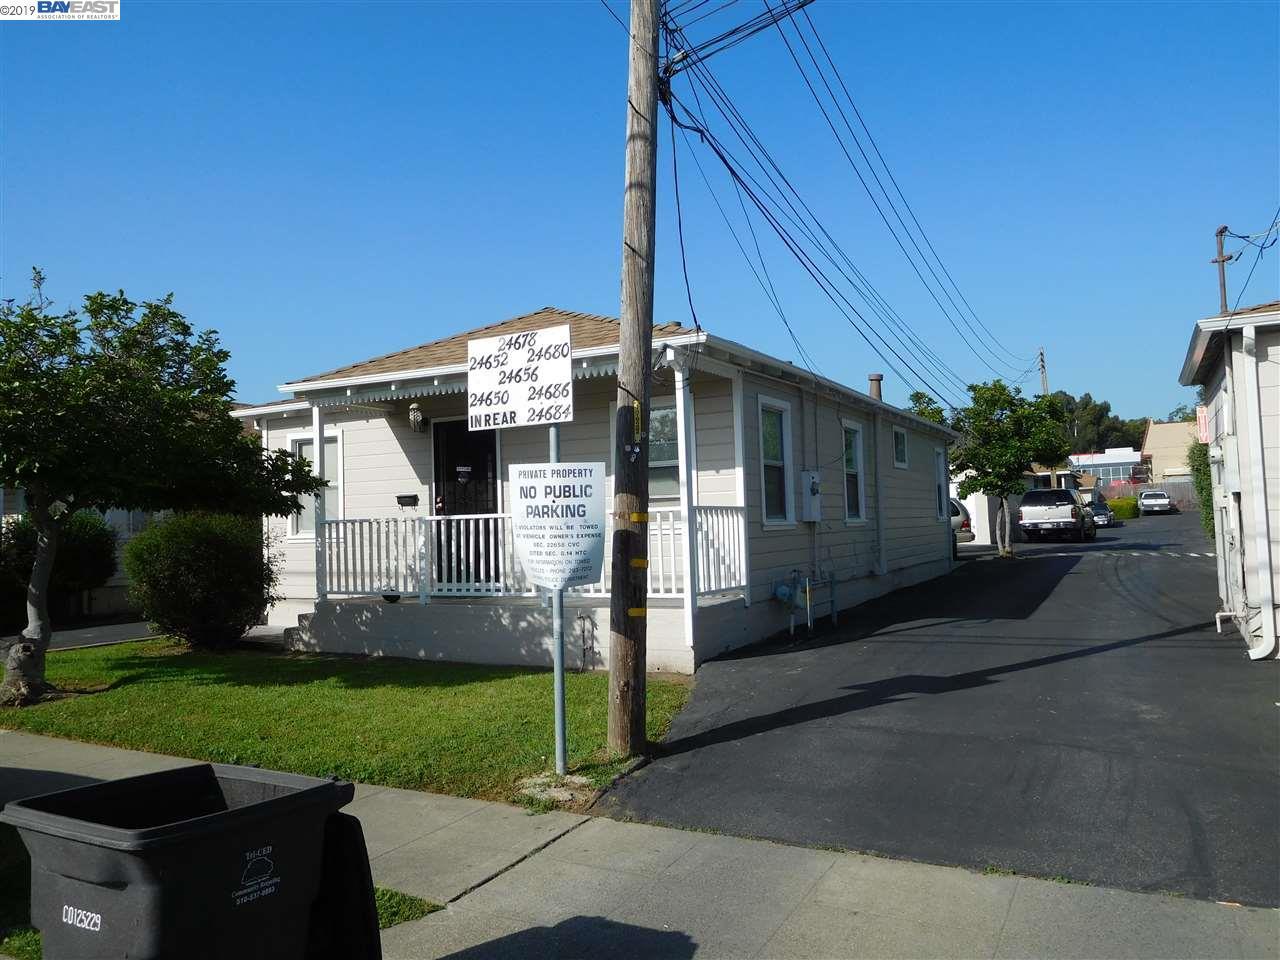 24652 Oneil Ave Hayward, CA 94544